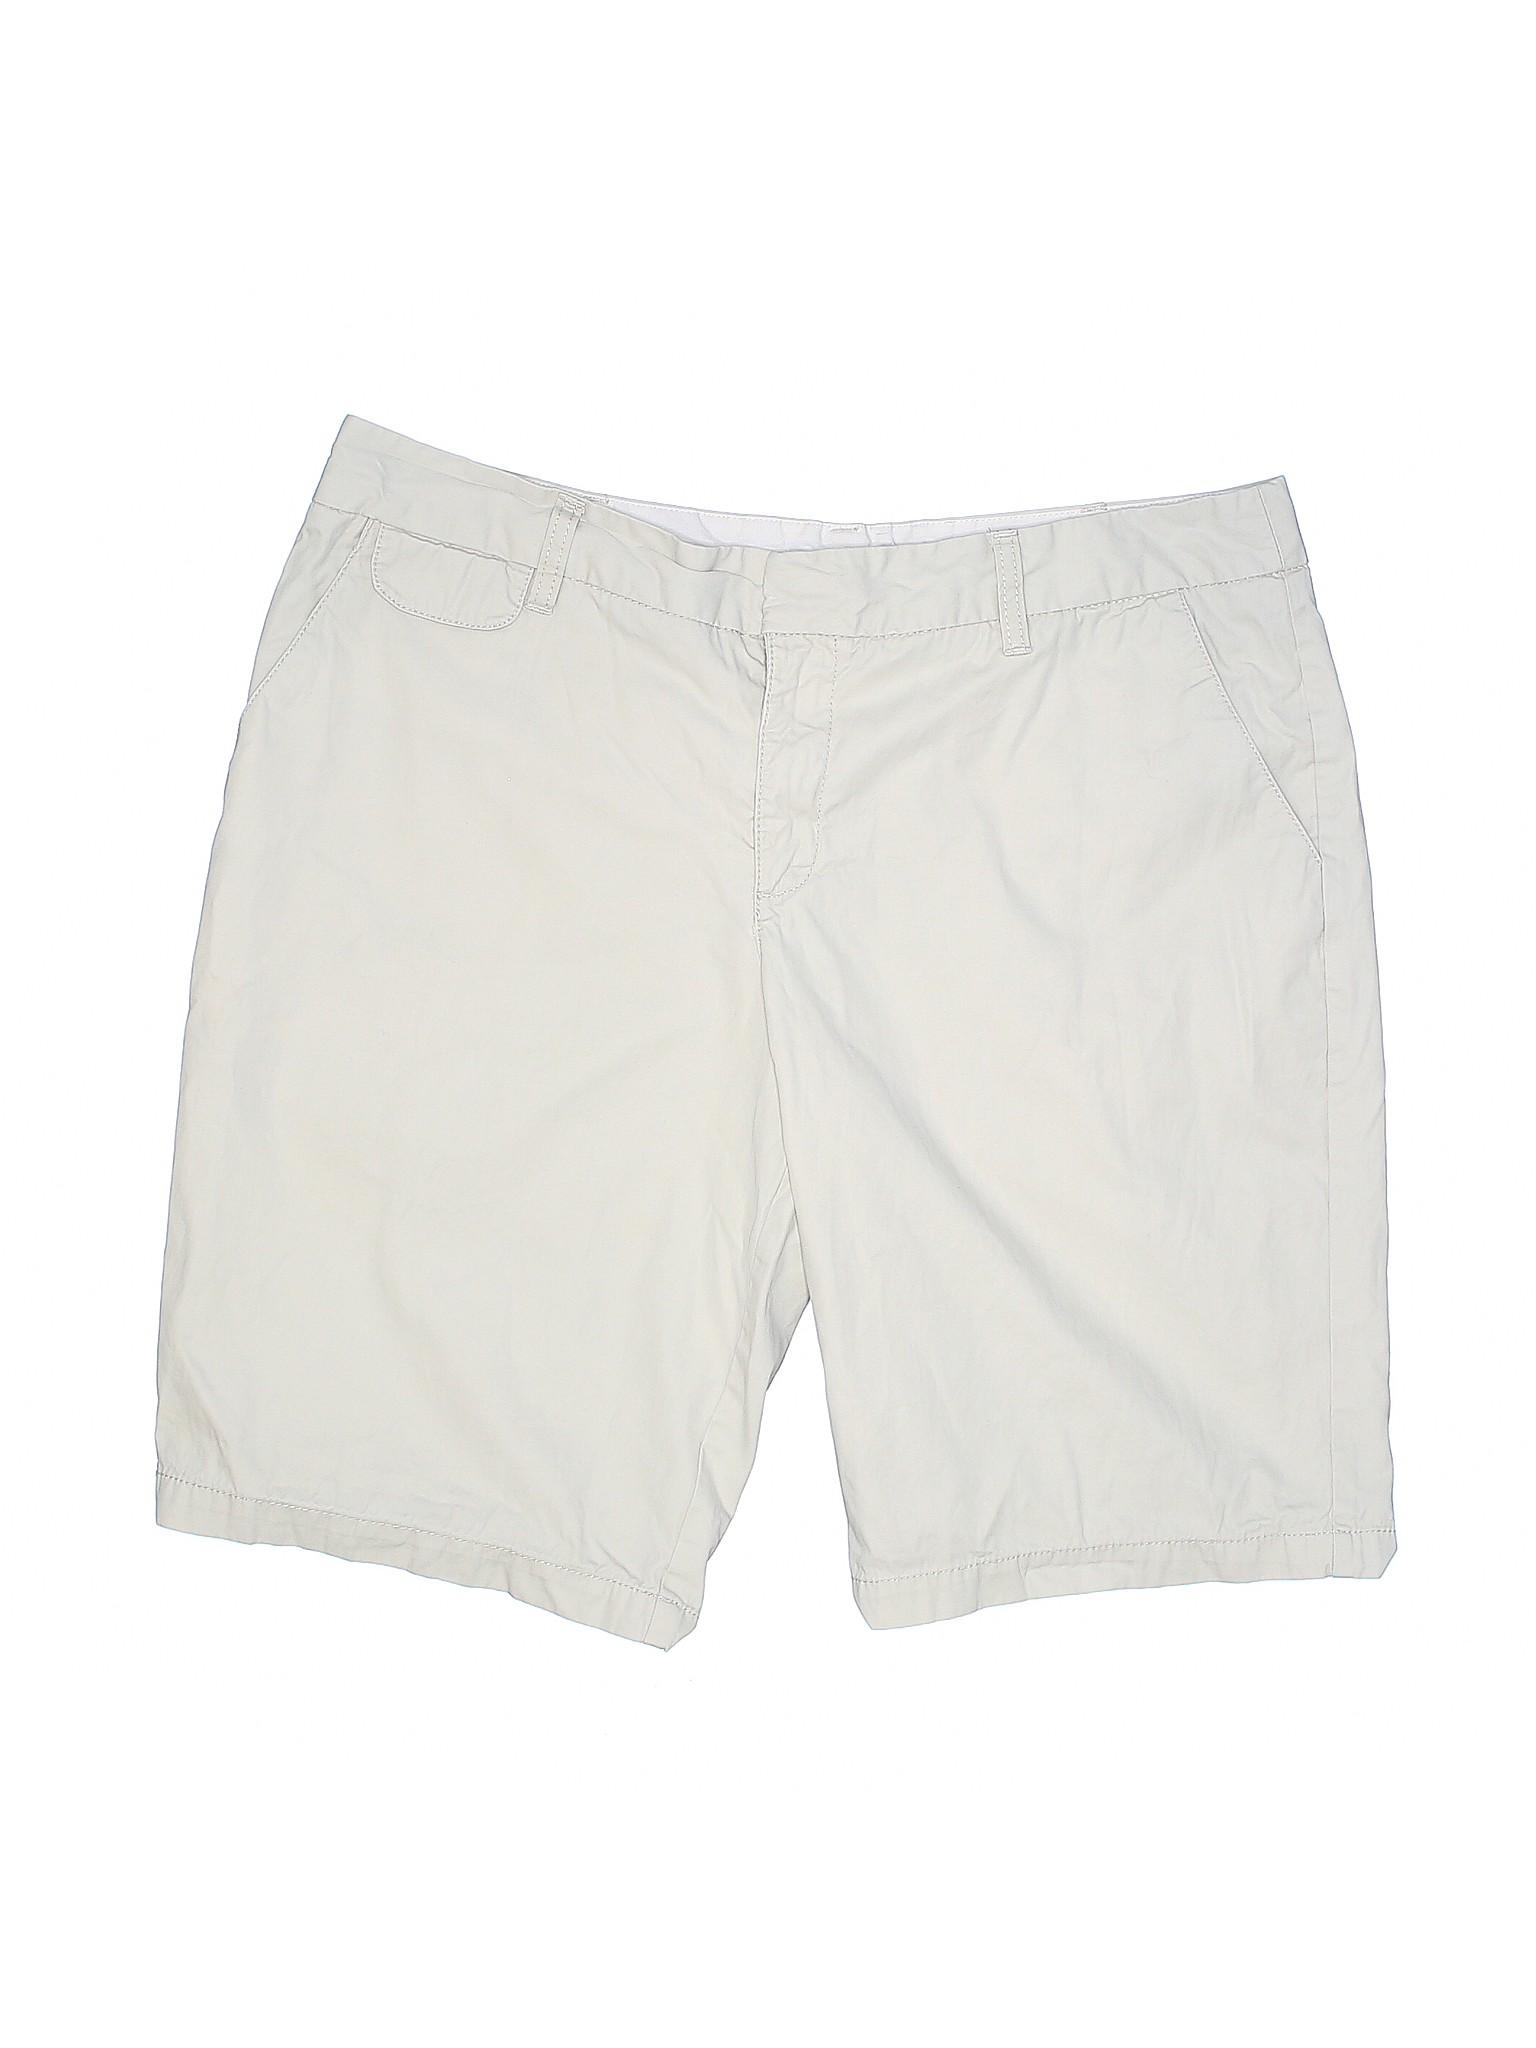 Shorts Boutique Merona Merona Boutique Khaki OqYRZxw